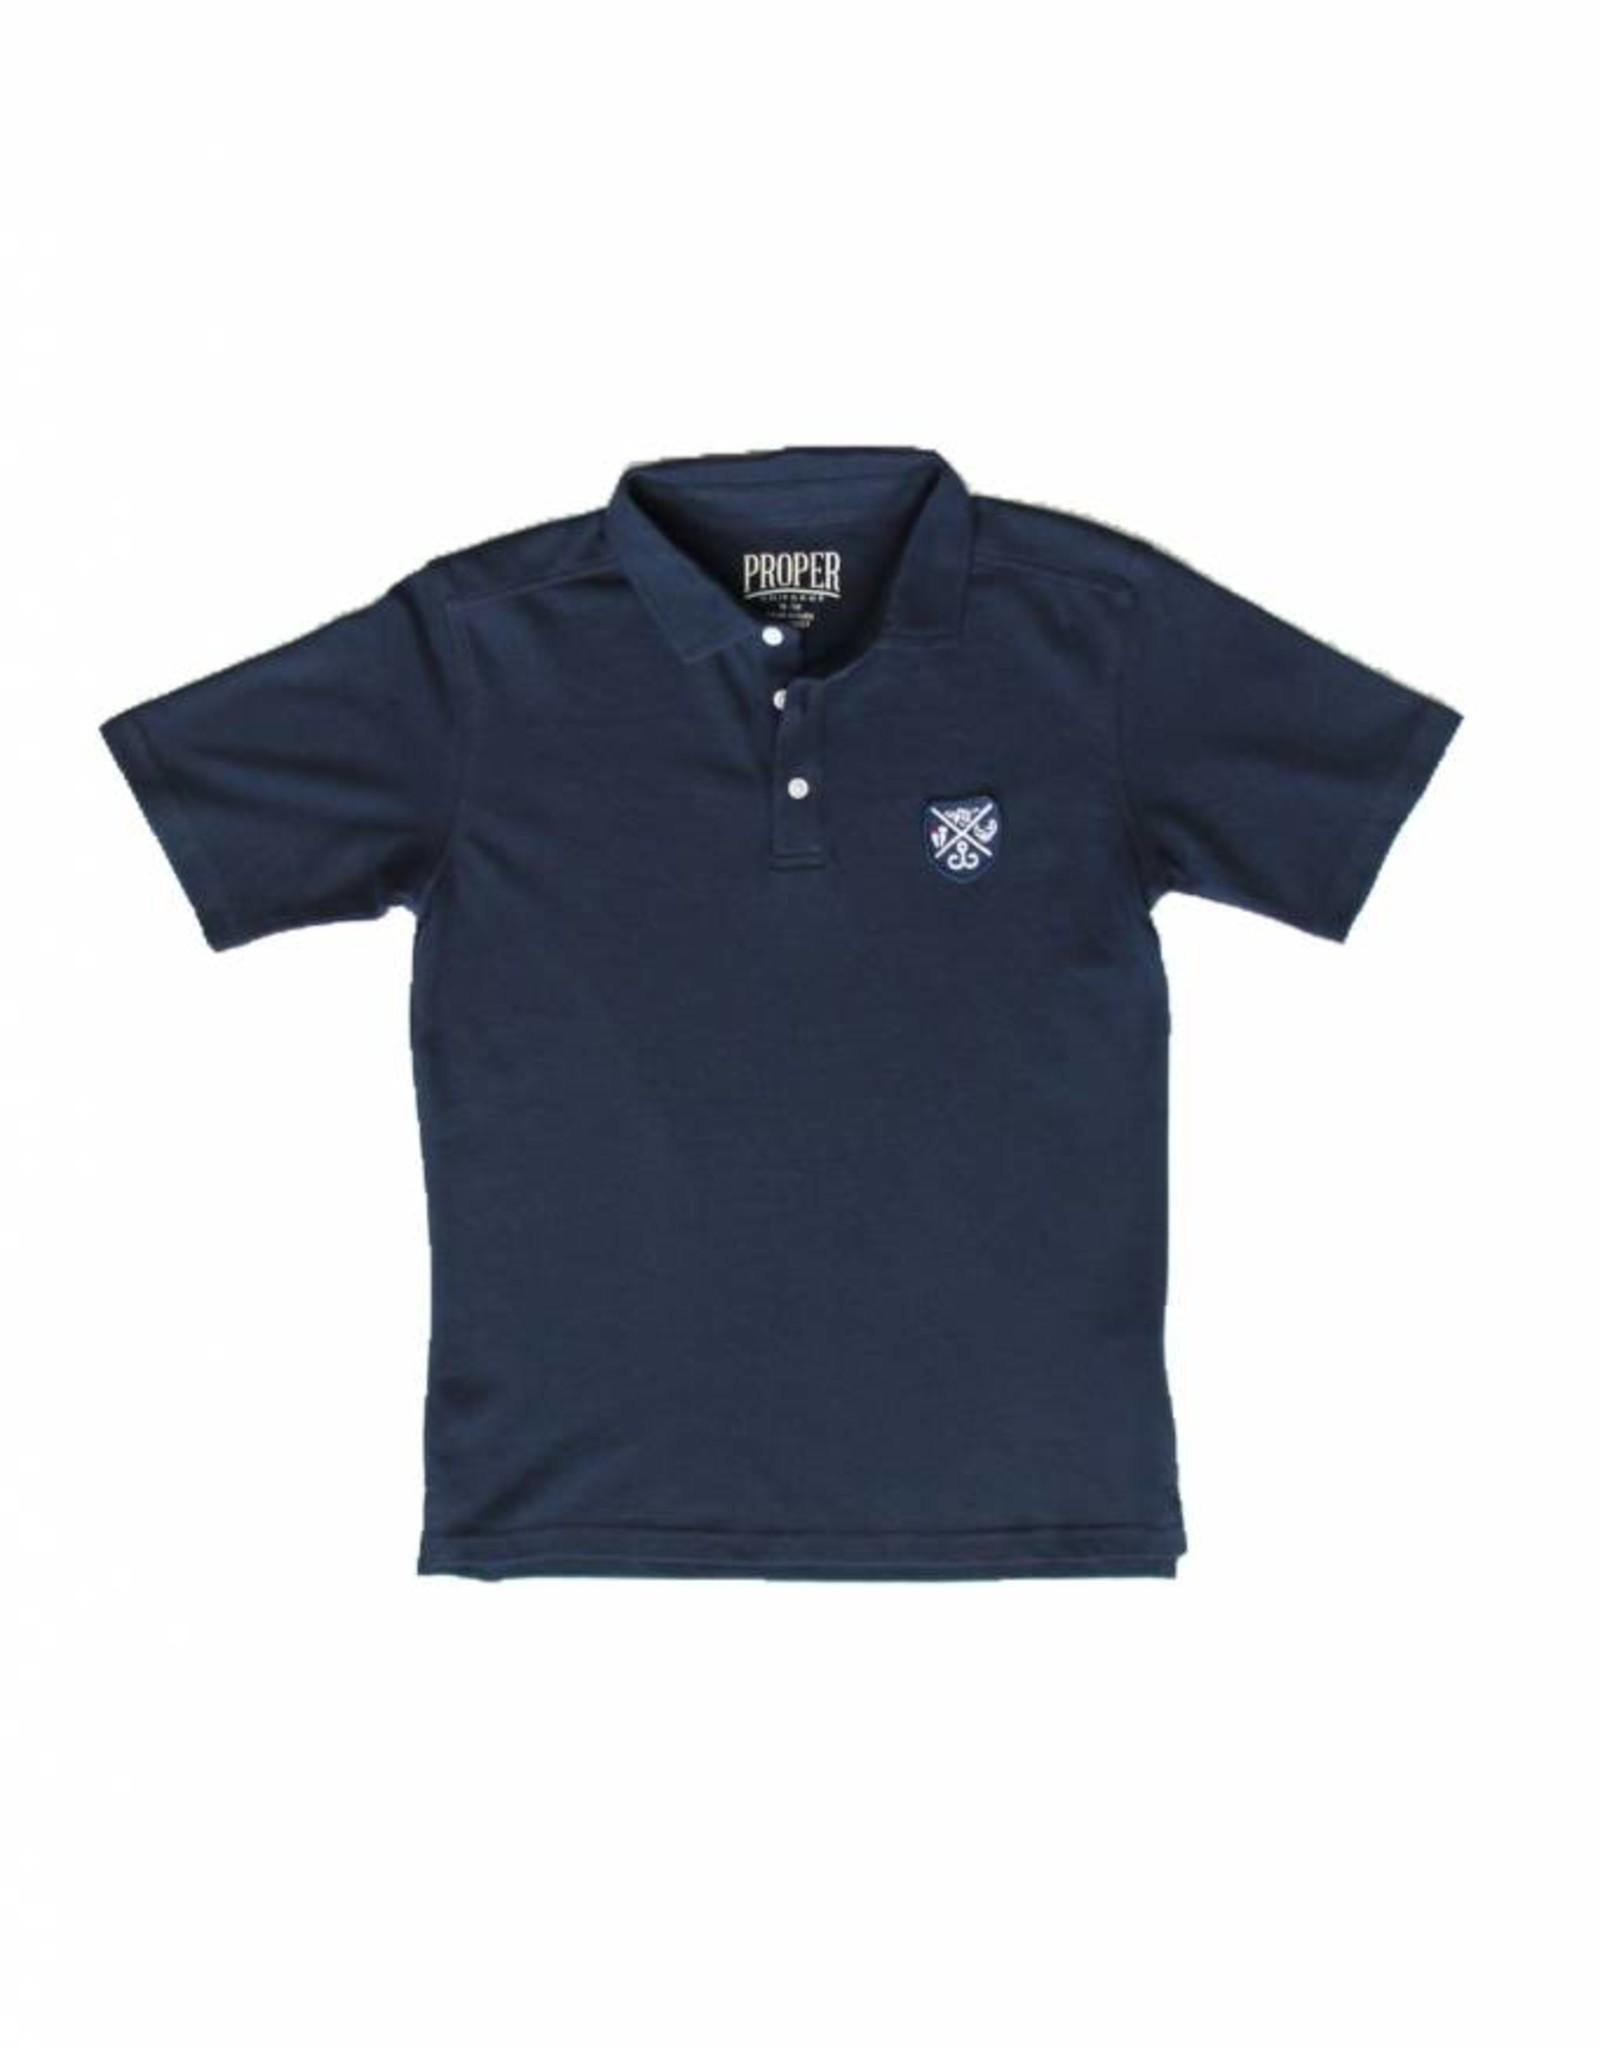 Proper Uniforms SHIRT-Comfort Toddler